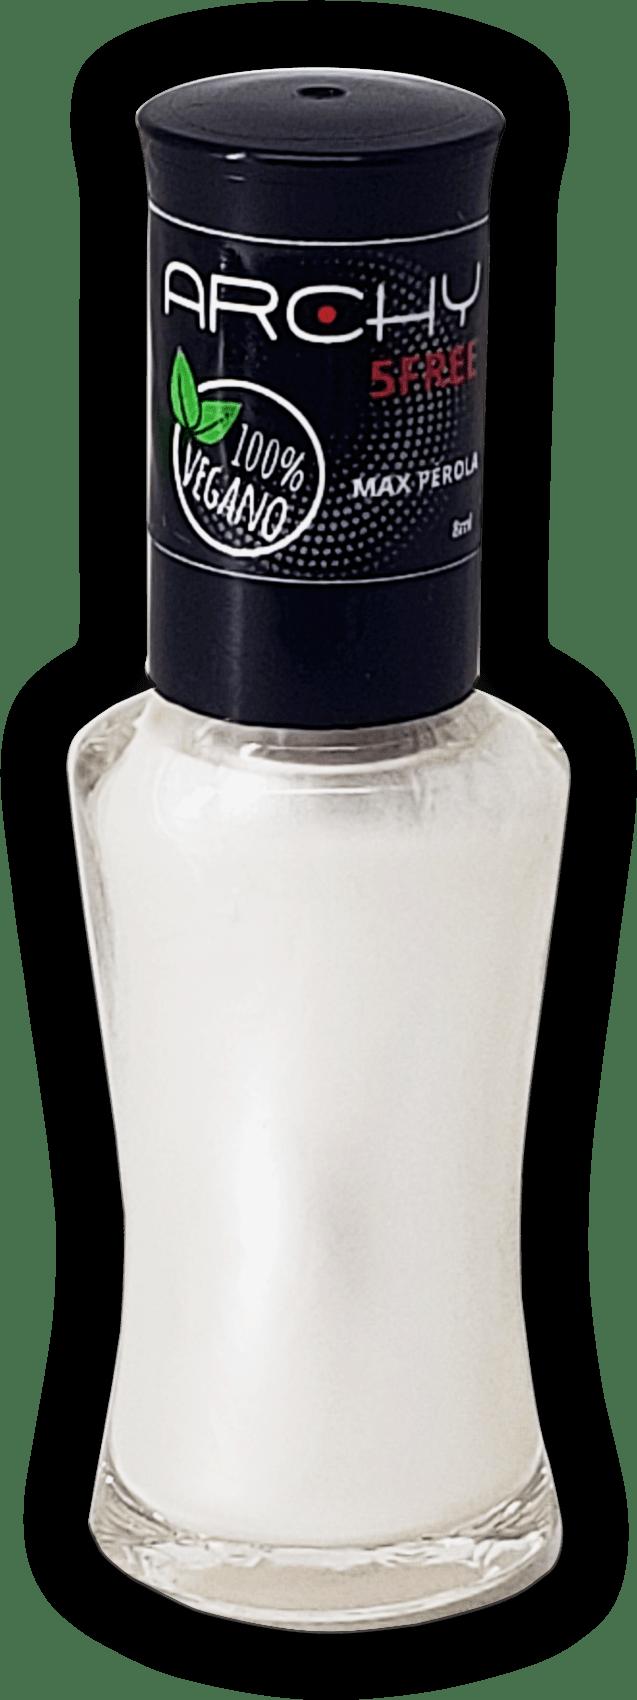 Esmalte Vegano 5 Free Max Pérola - Archy Make Up